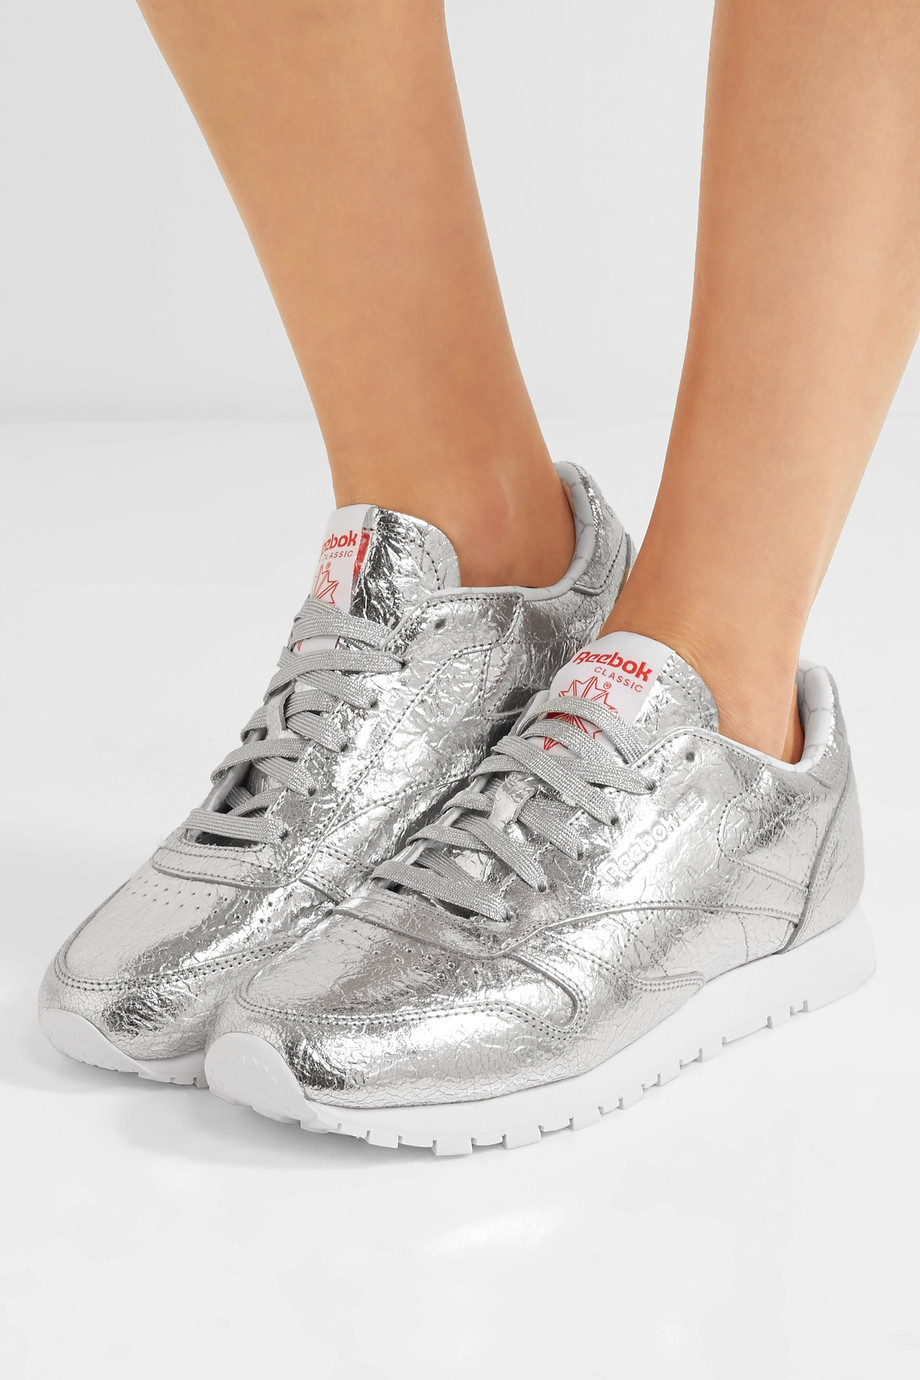 <a href='https://www.net-a-porter.com/hu/en/product/879394/reebok/classic-metallic-crinkled-leather-sneakers' target='_blank' rel='noopener noreferrer'>Reebok</a></p>